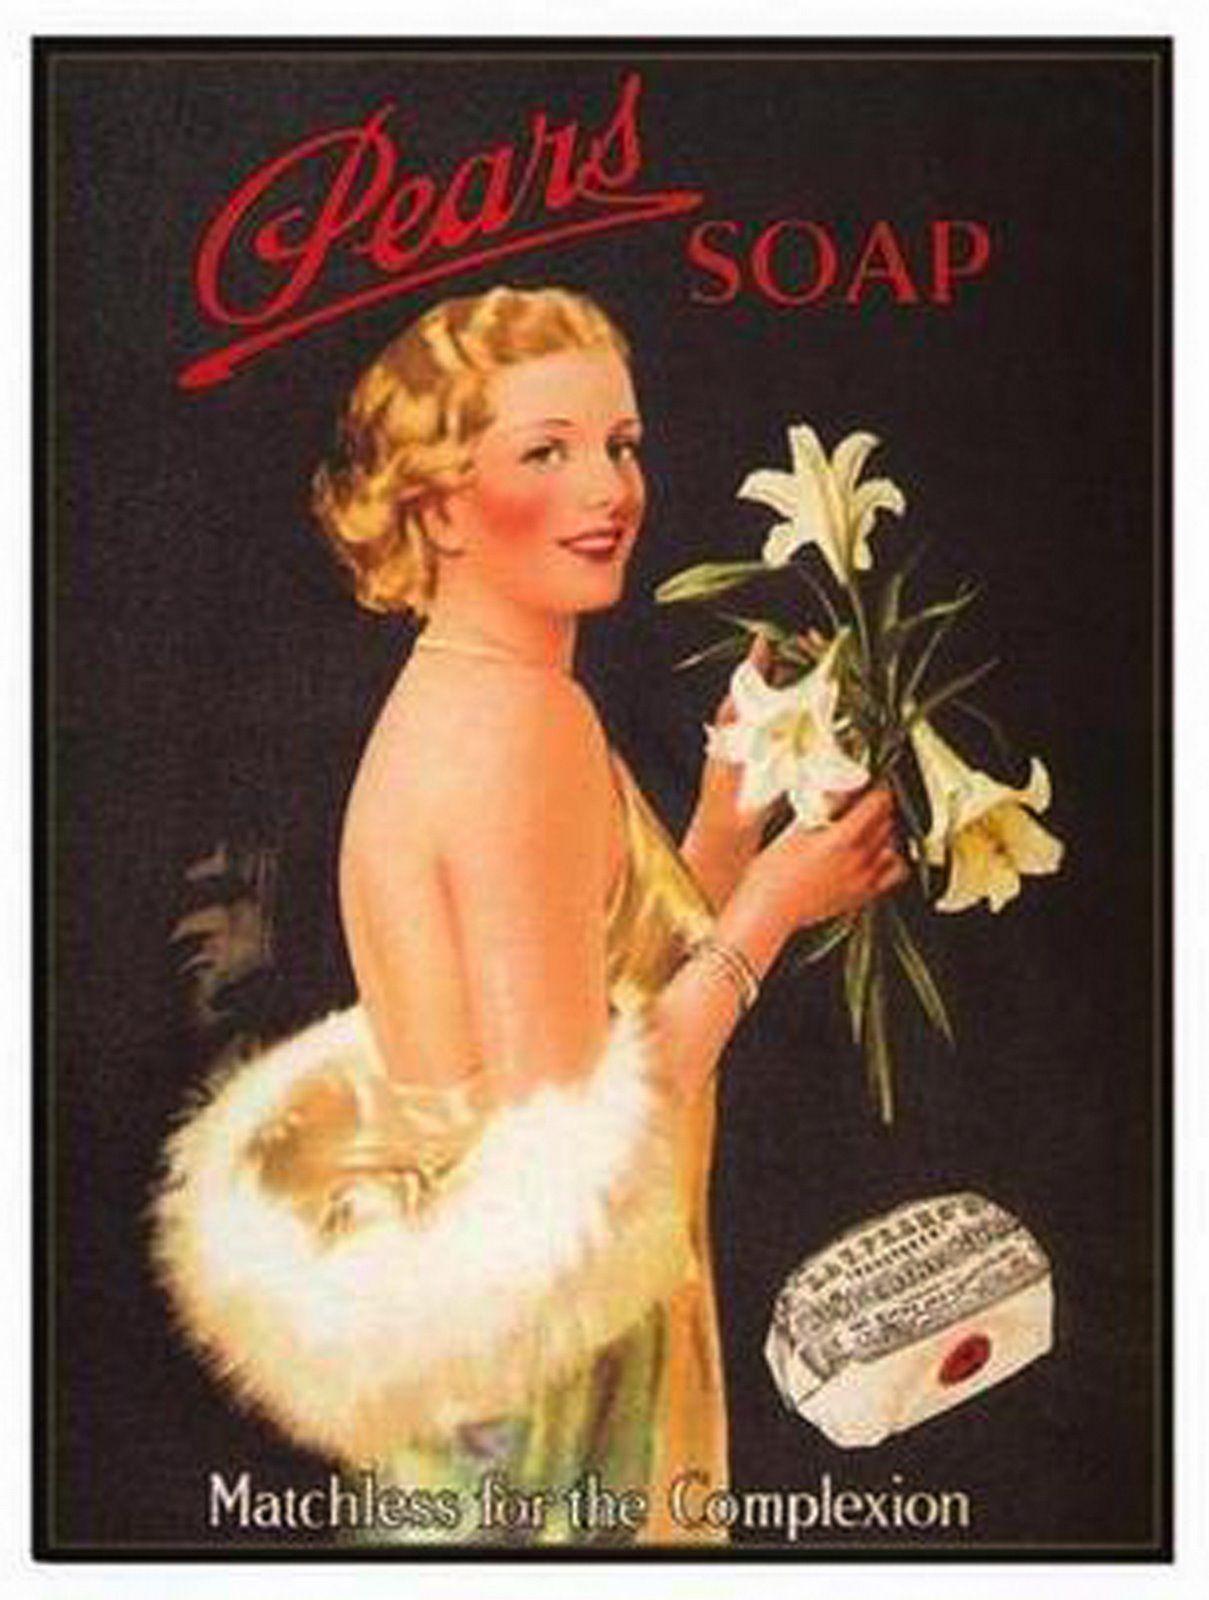 Vintage commercial art